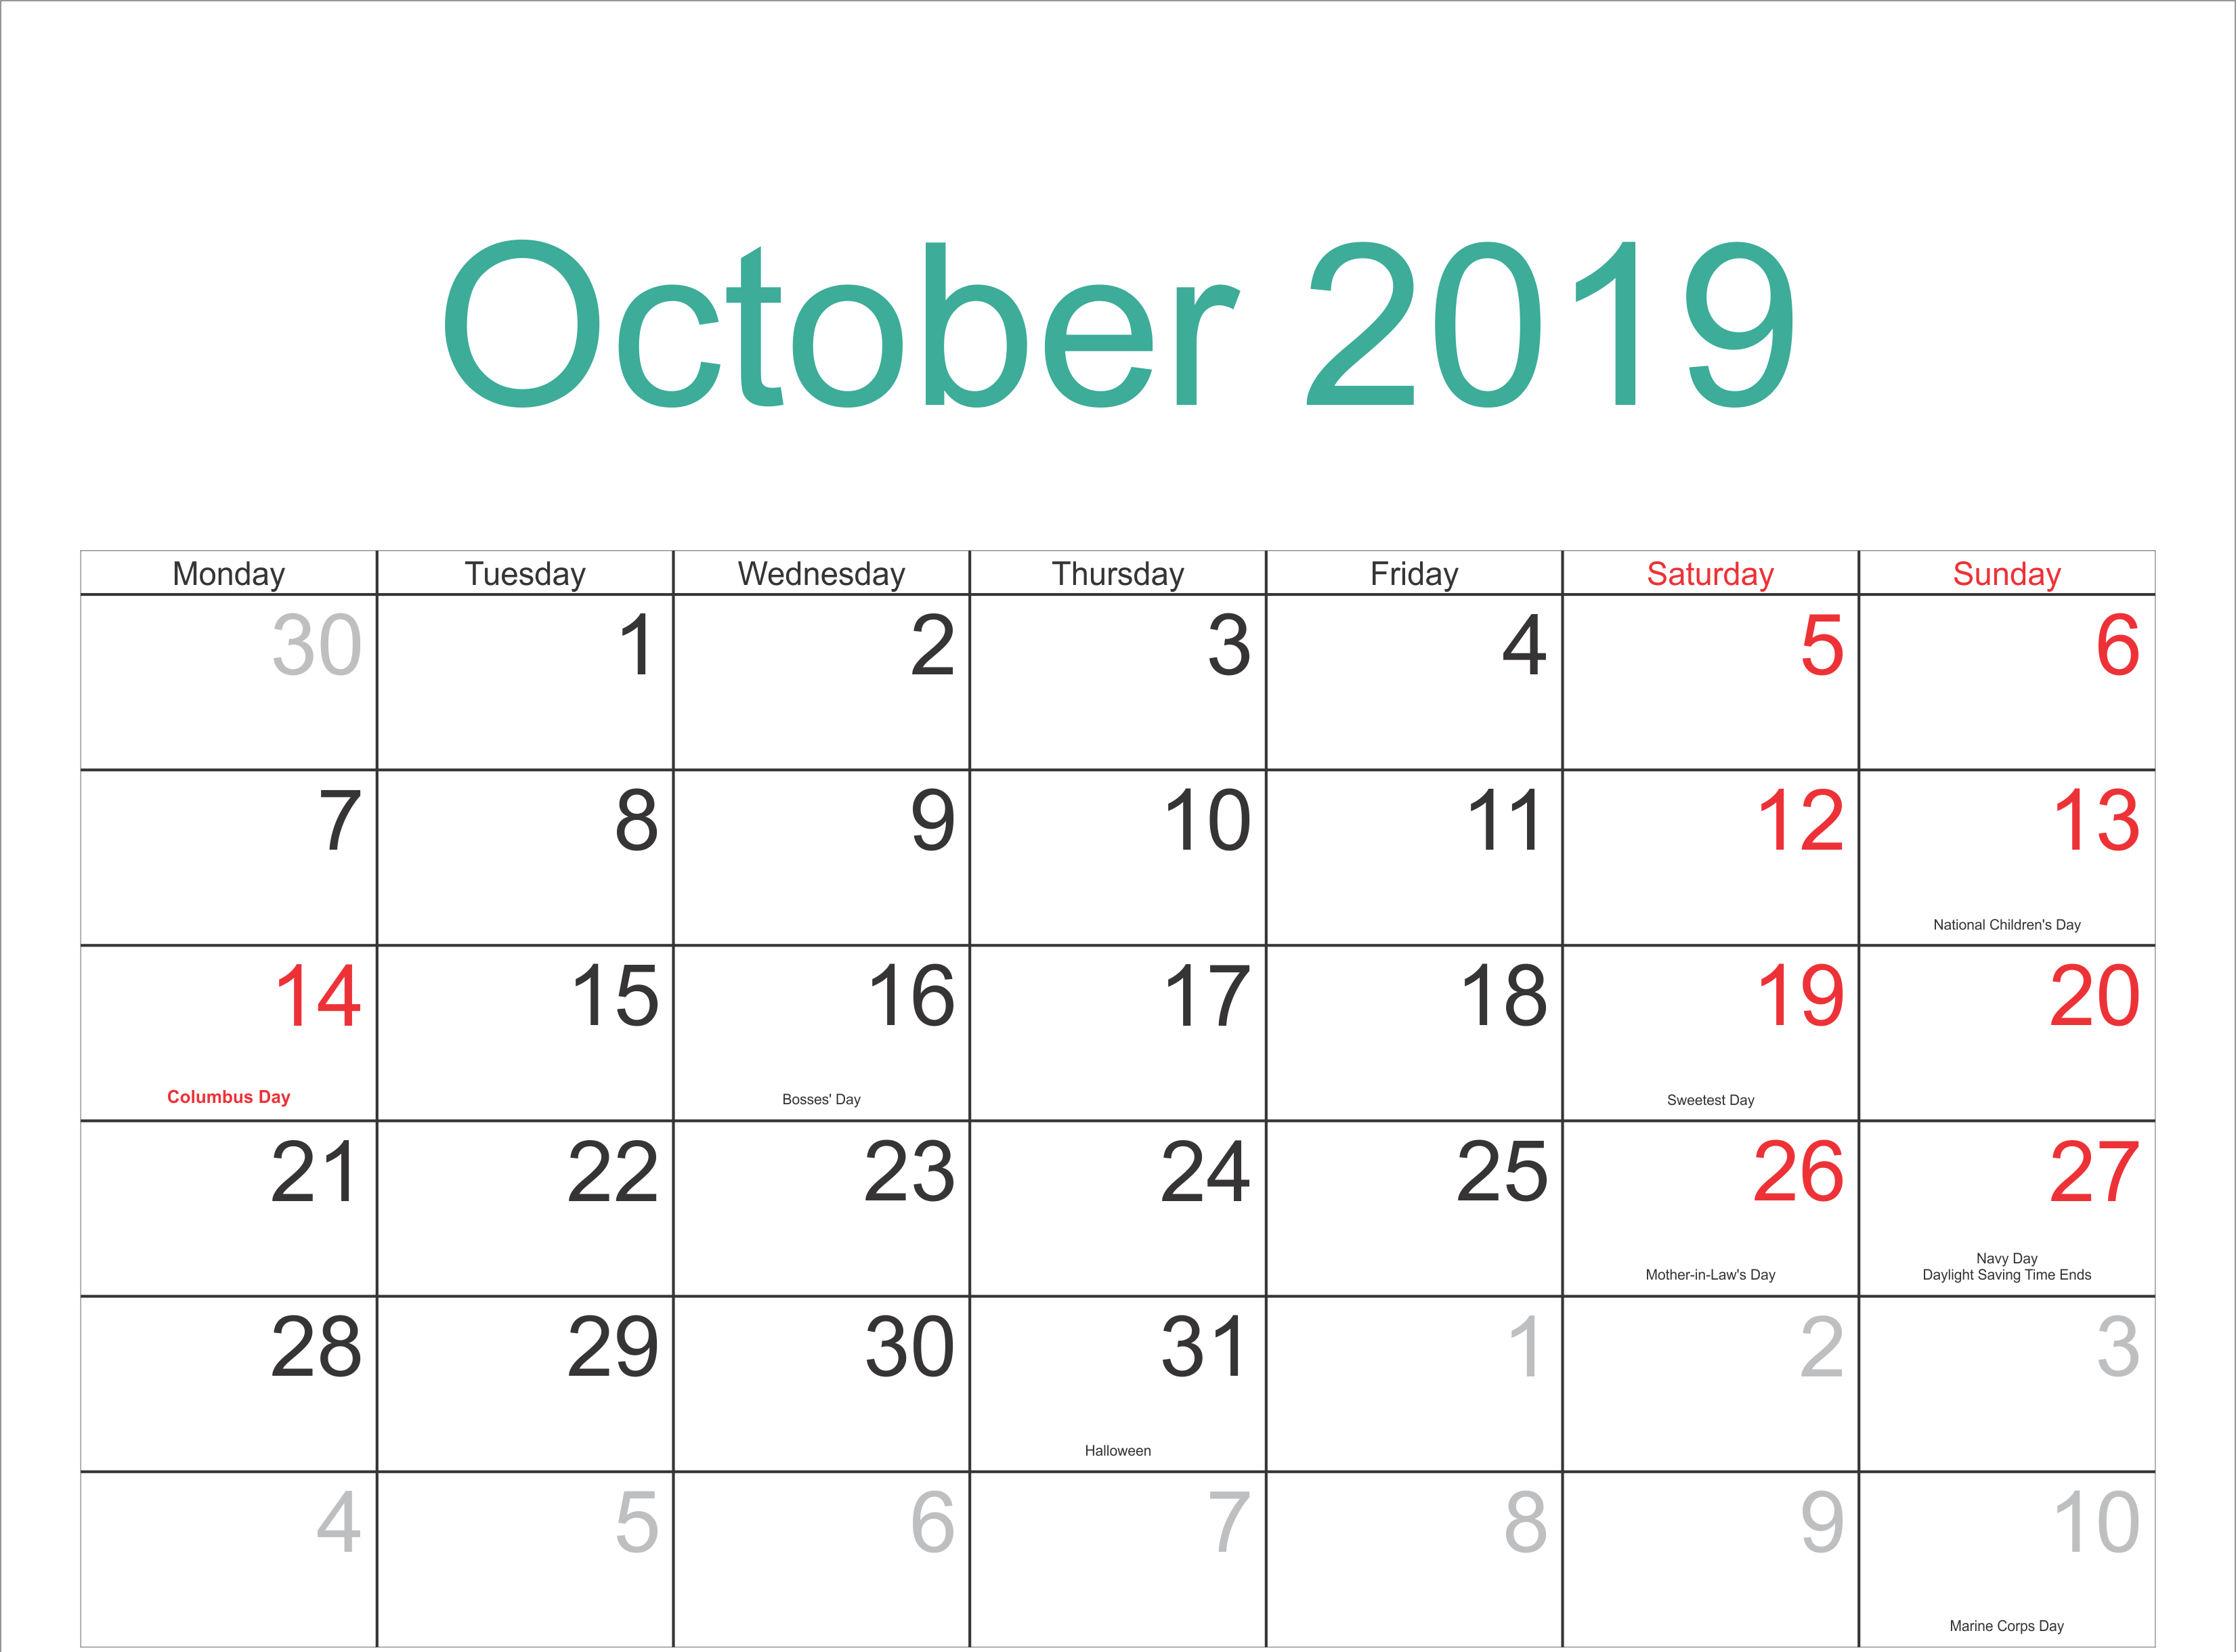 October 2019 Calendar With Holidays Template Holiday Calendar Calendar Template October Calendar